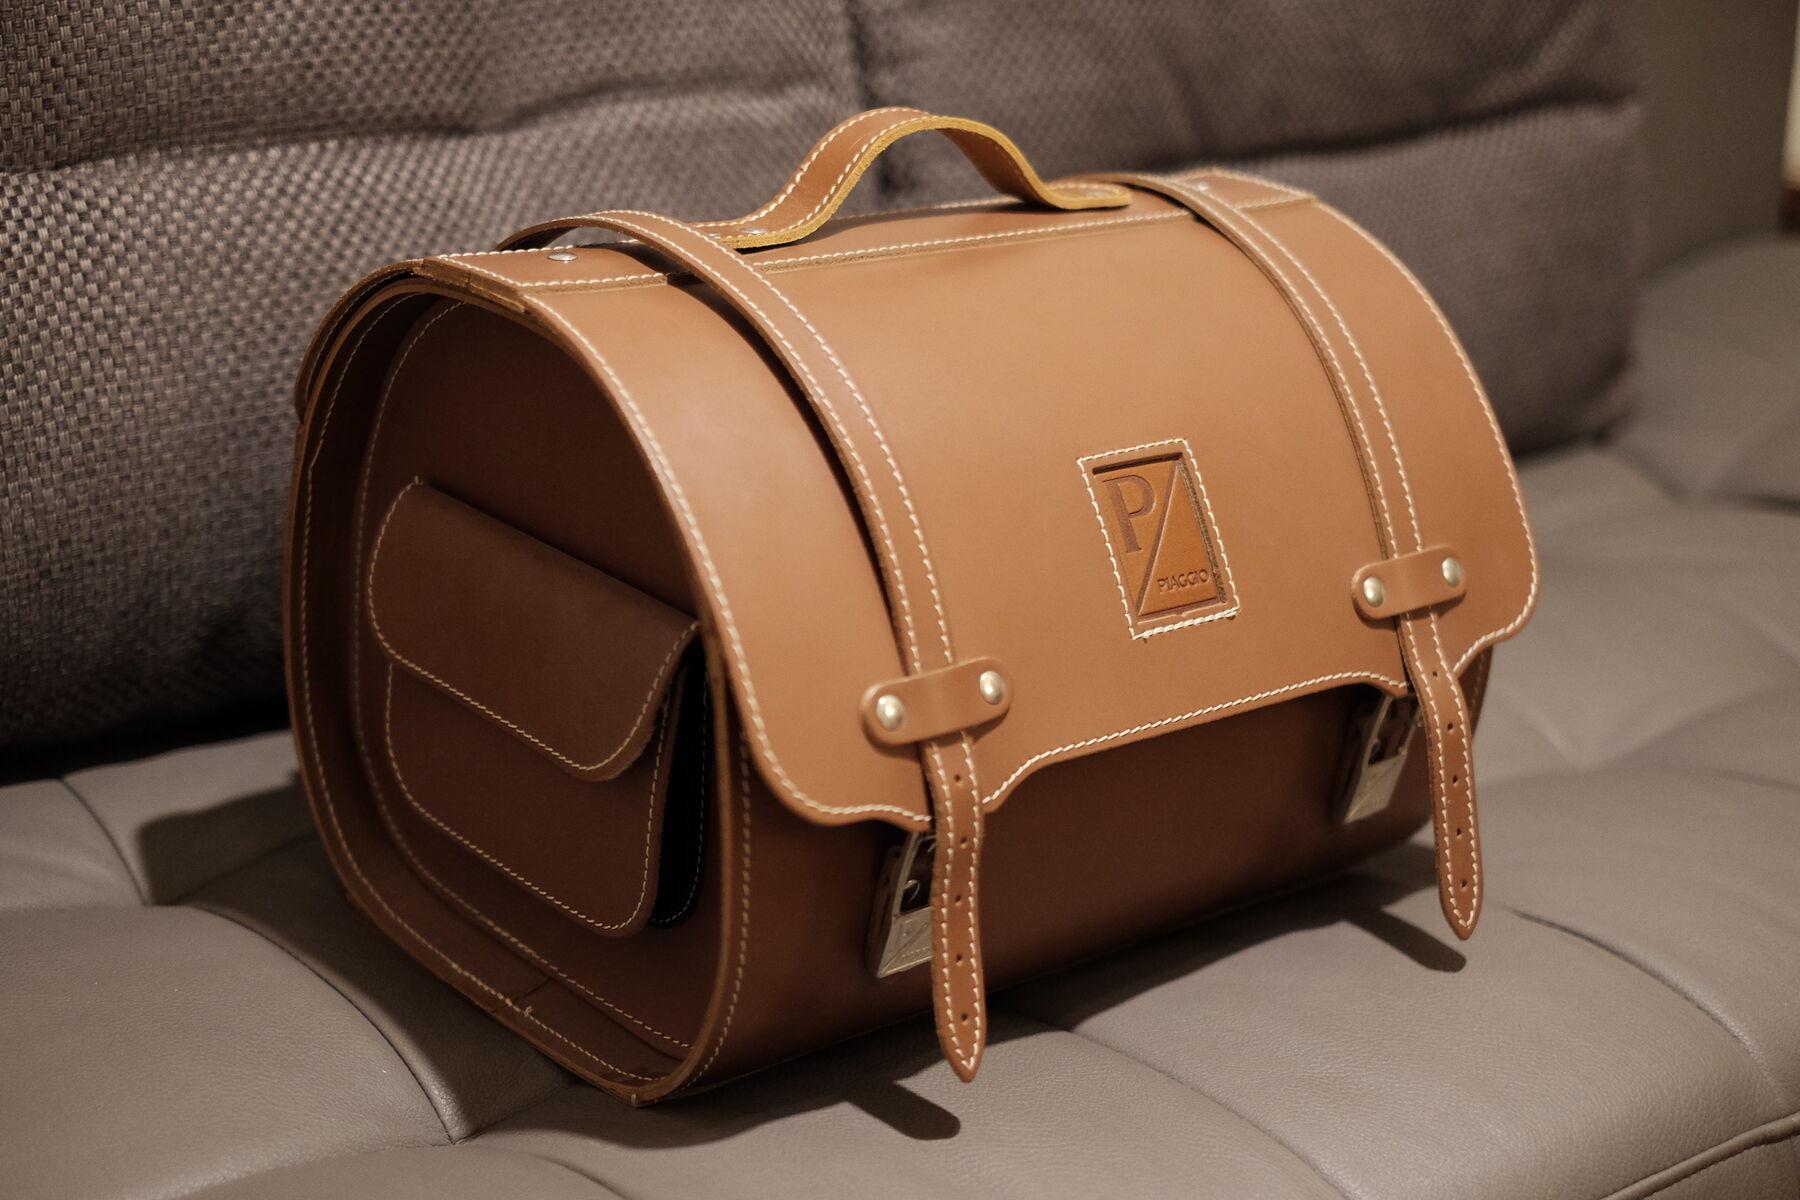 original piaggio leder koffer top case neu unbenutzt. Black Bedroom Furniture Sets. Home Design Ideas